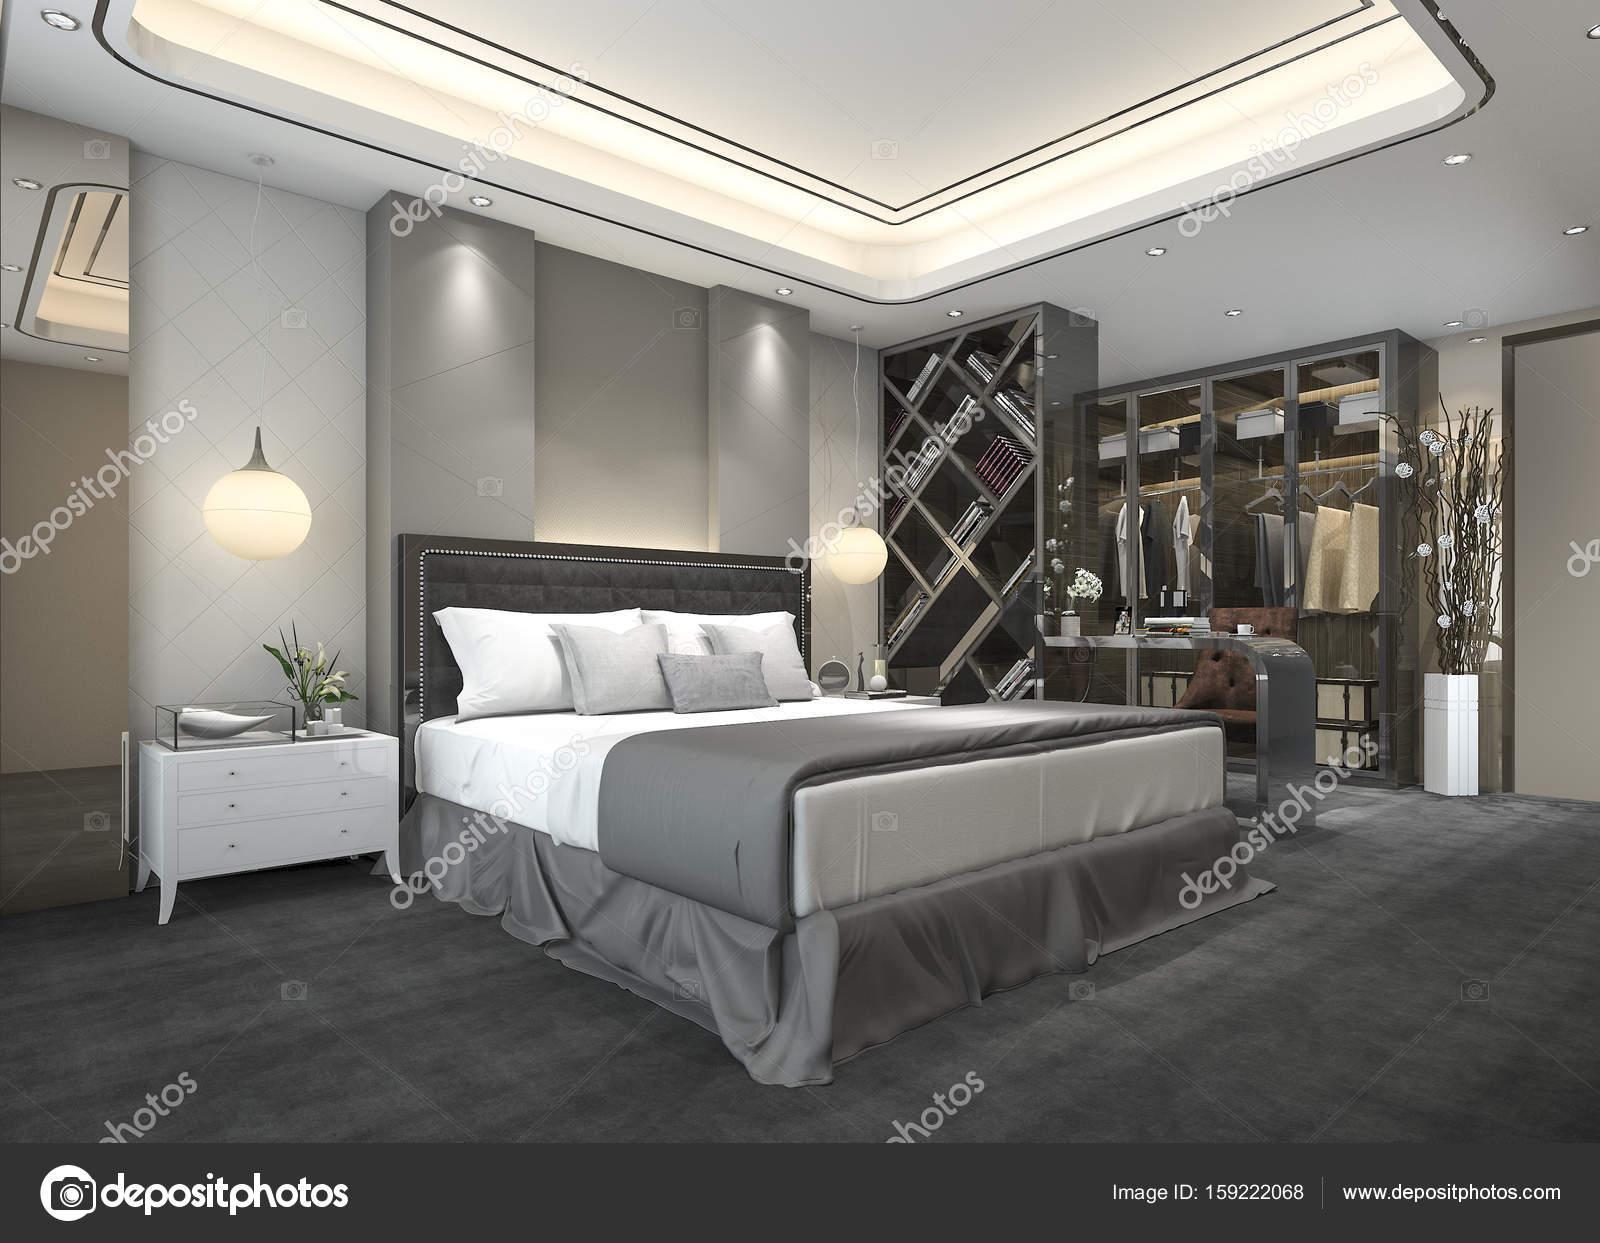 https://st3.depositphotos.com/11352286/15922/i/1600/depositphotos_159222068-stockafbeelding-3d-rendering-luxe-moderne-slaapkamer.jpg